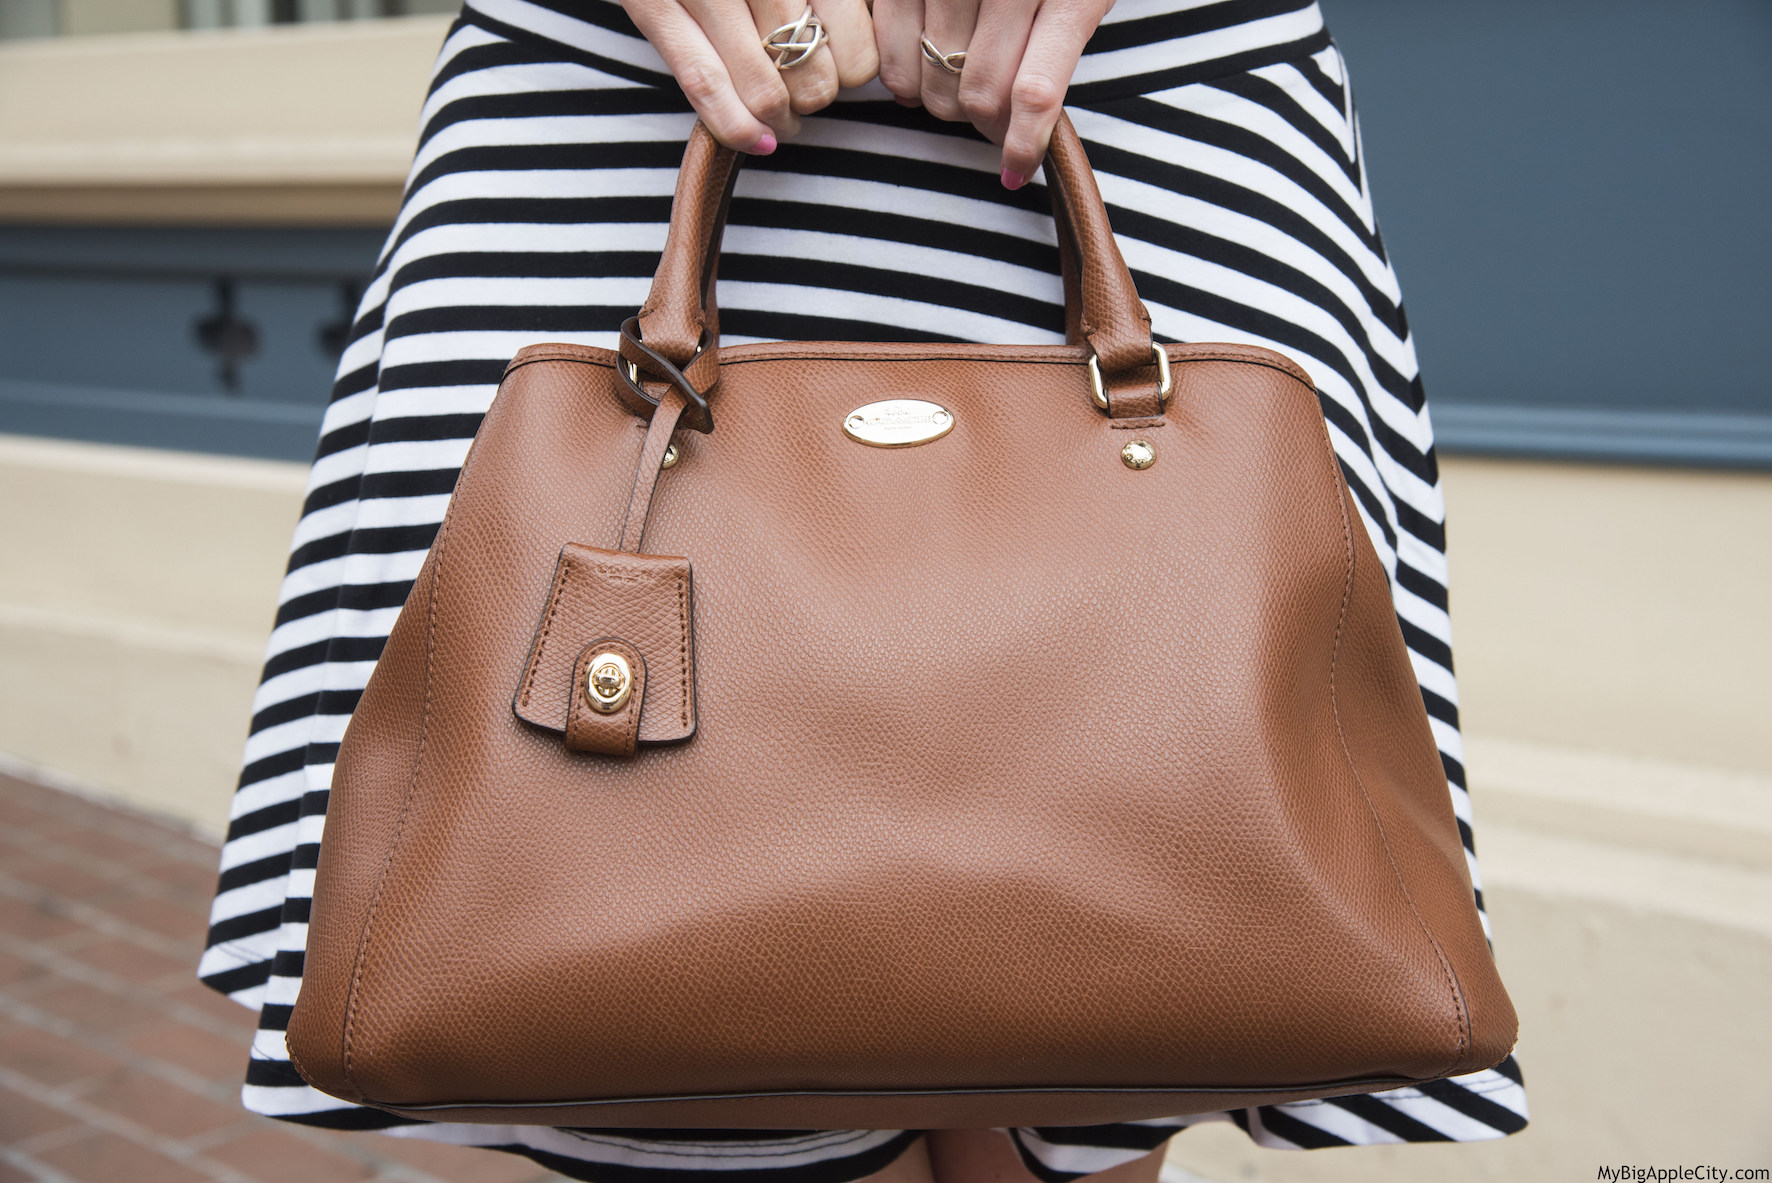 Fashion-blogger-ootd-coach-bag-mybigapplecity